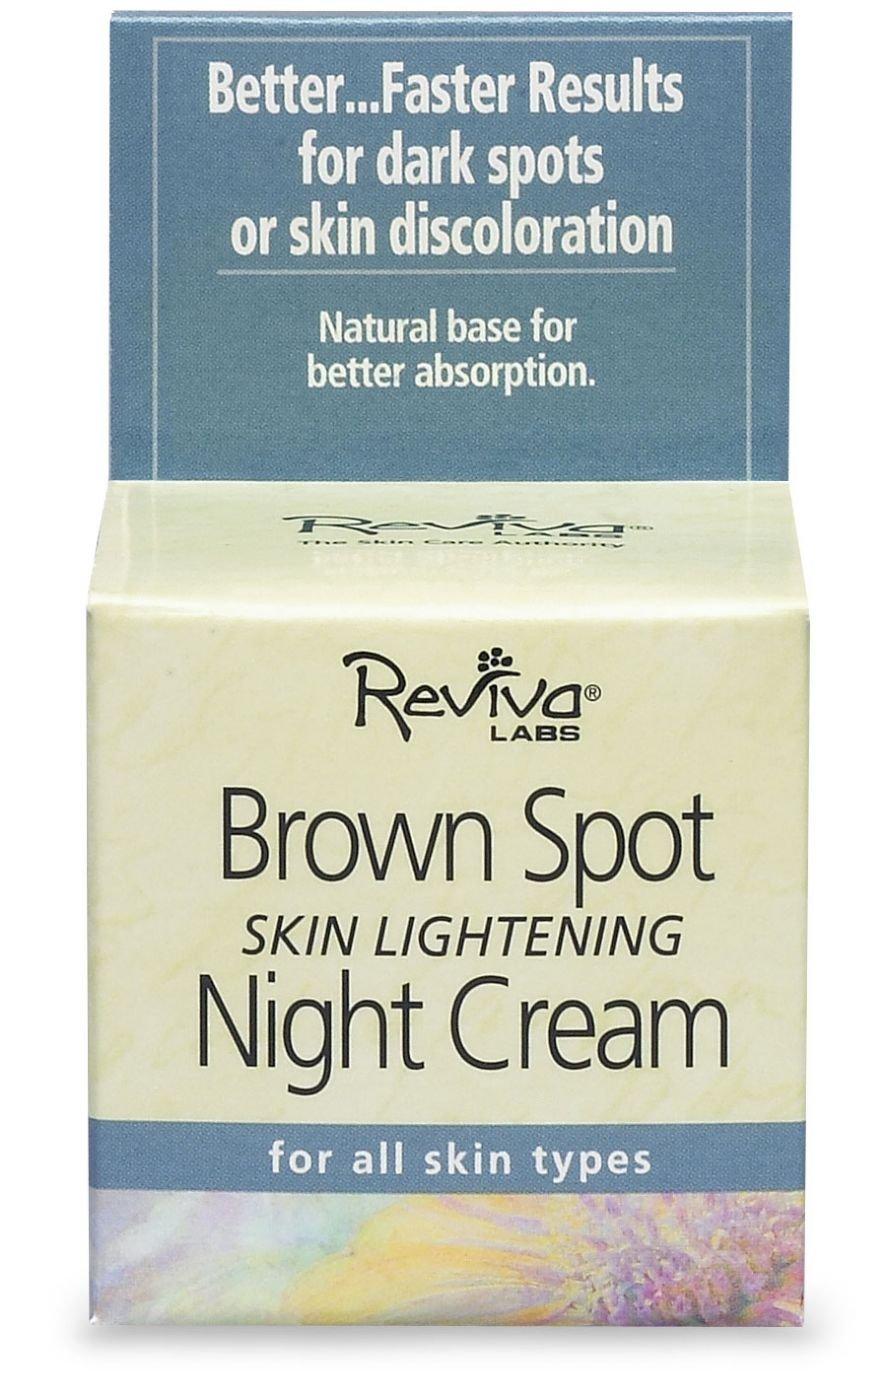 Reviva Labs - Brown Spot Skin Lightening Night Cream - 1.5 oz.